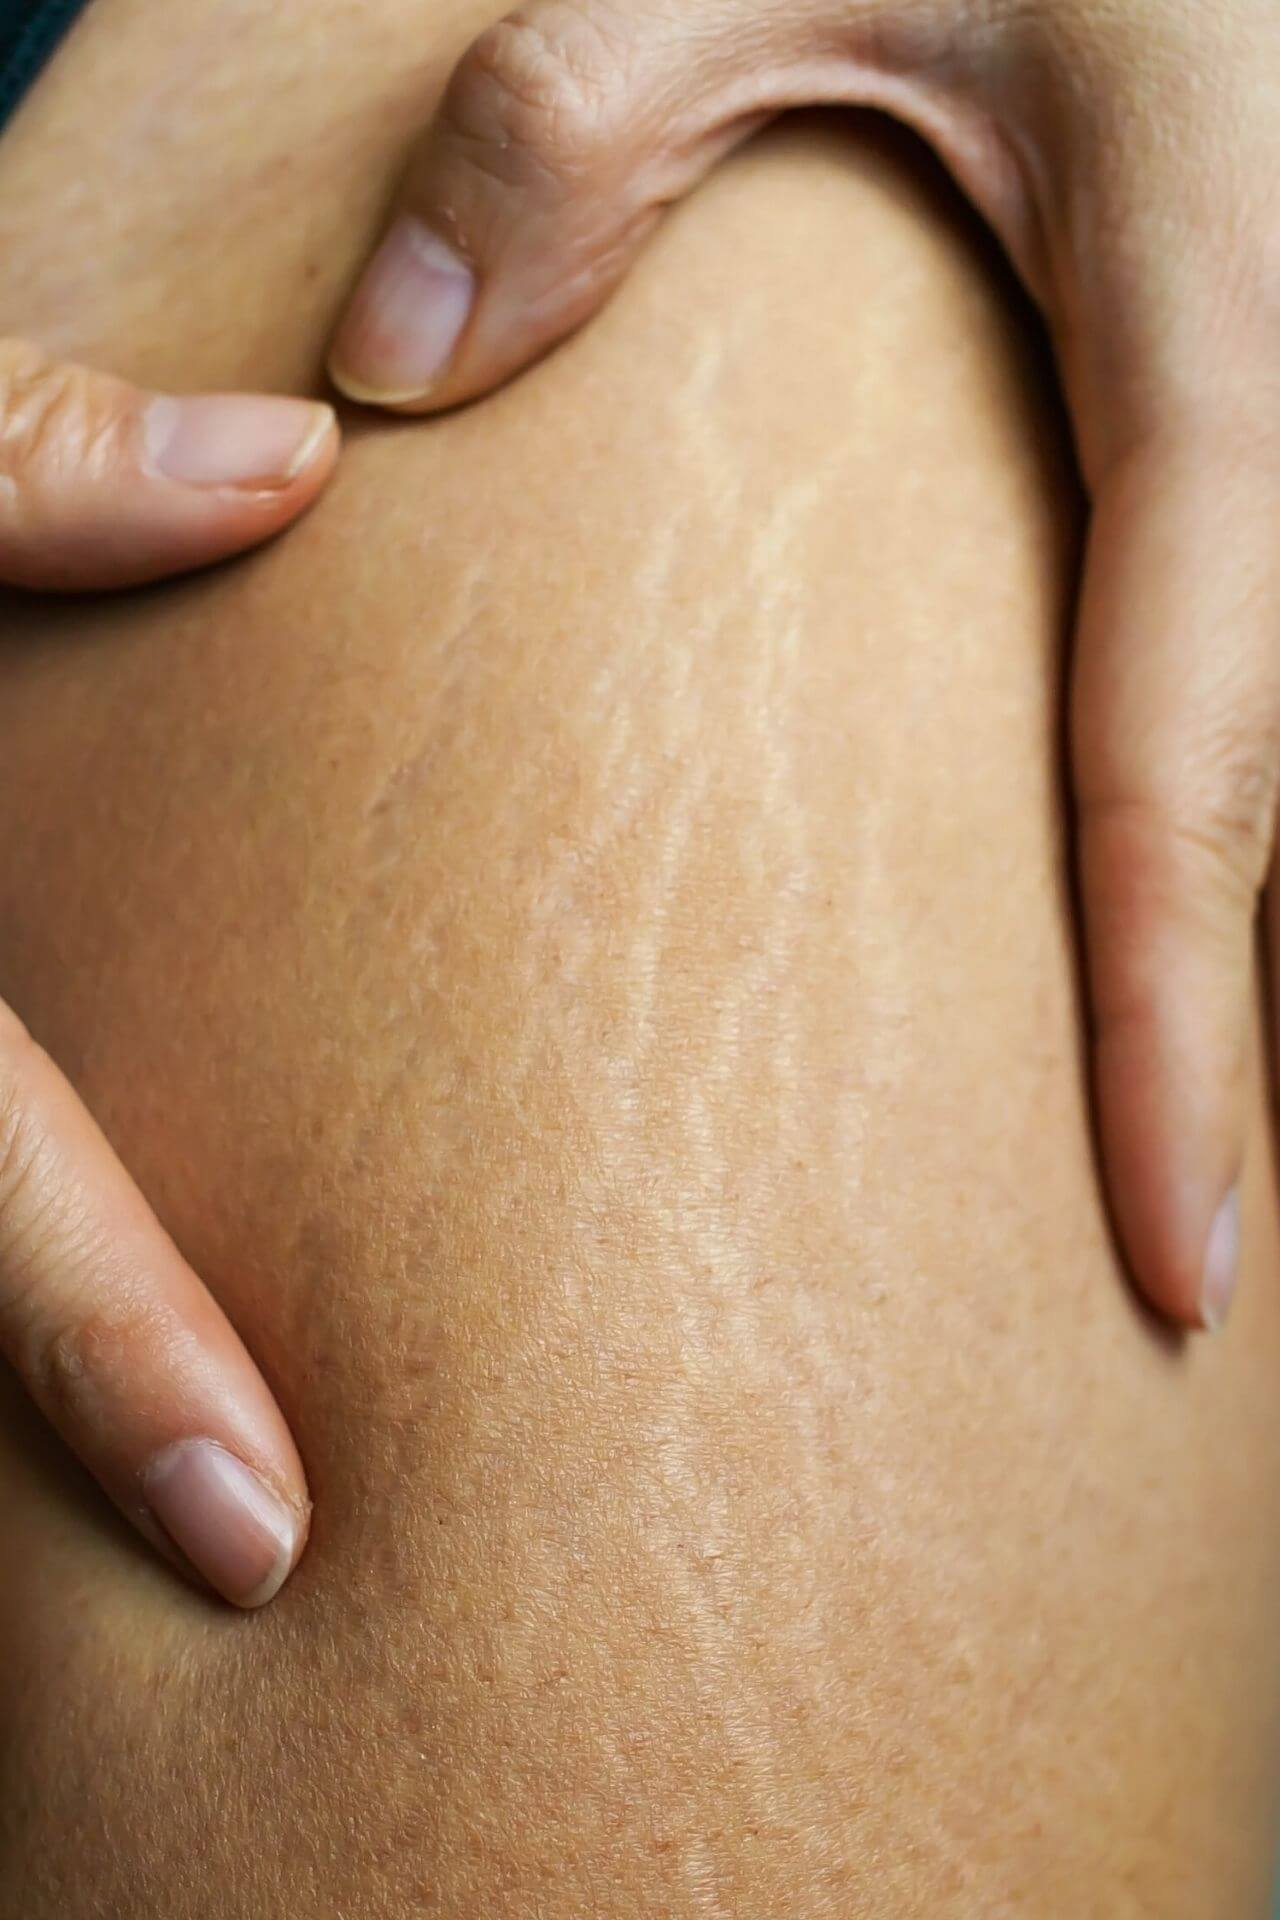 leg stretch mark removal miami skin spa